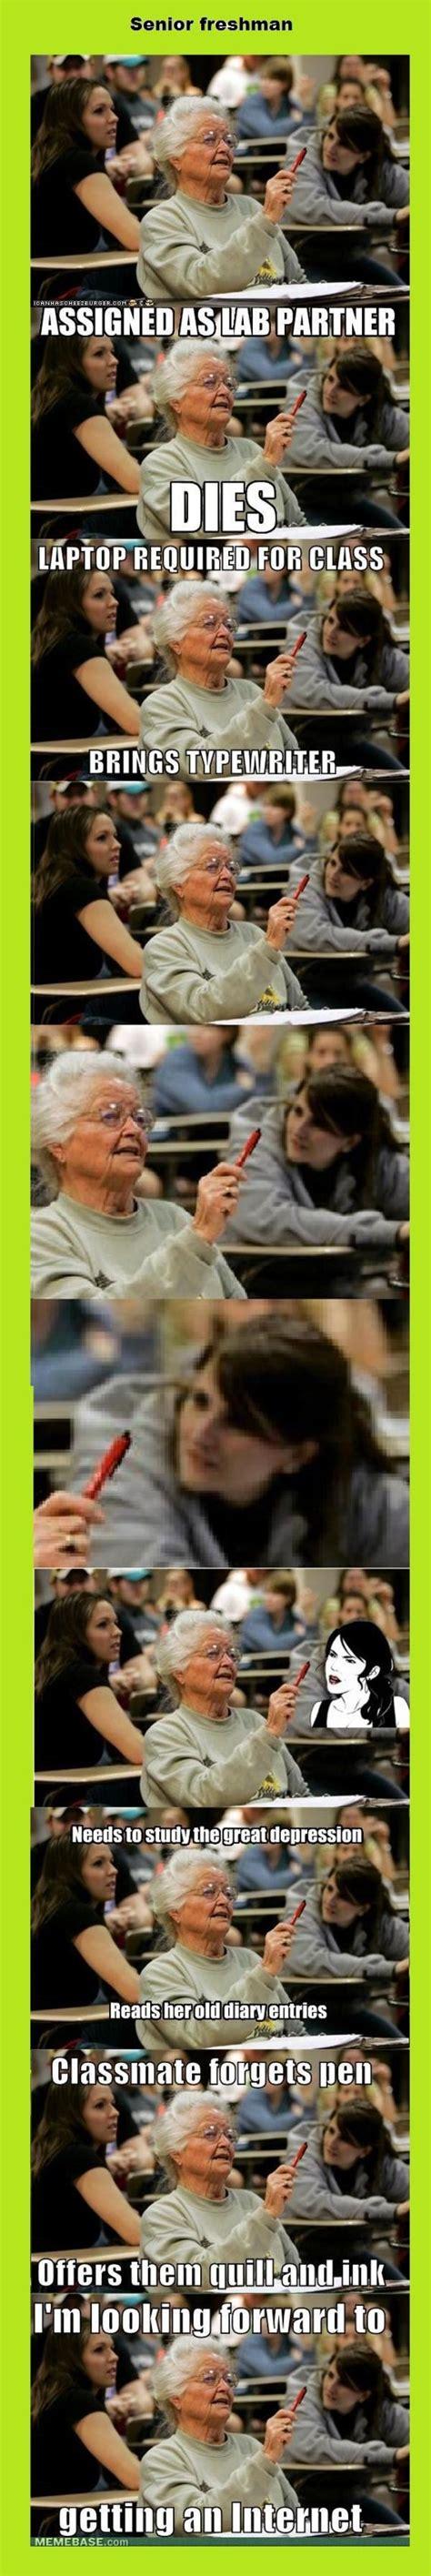 Senior College Student Meme - image 164001 senior college student know your meme